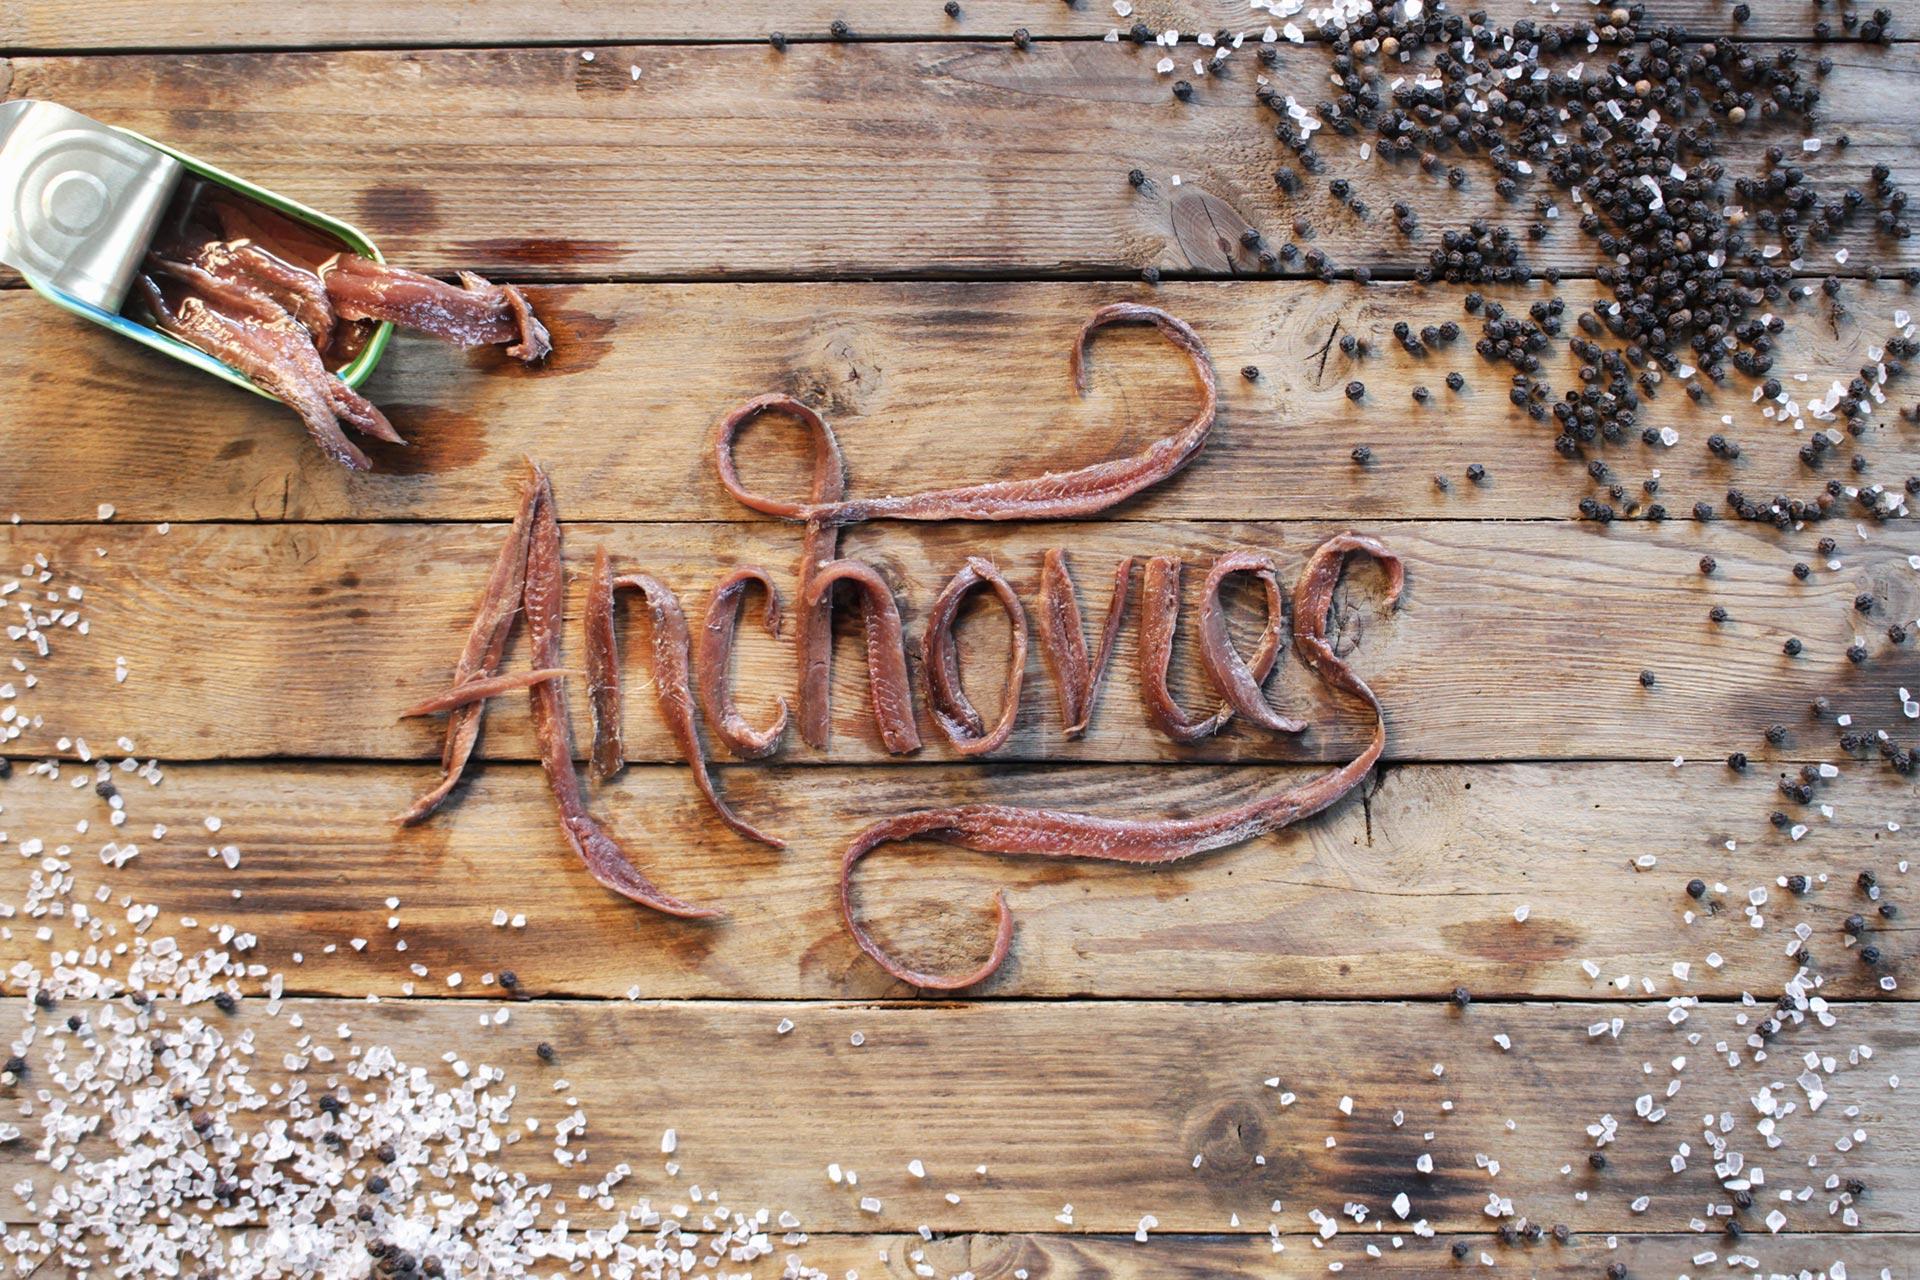 sainsburys_anchovies